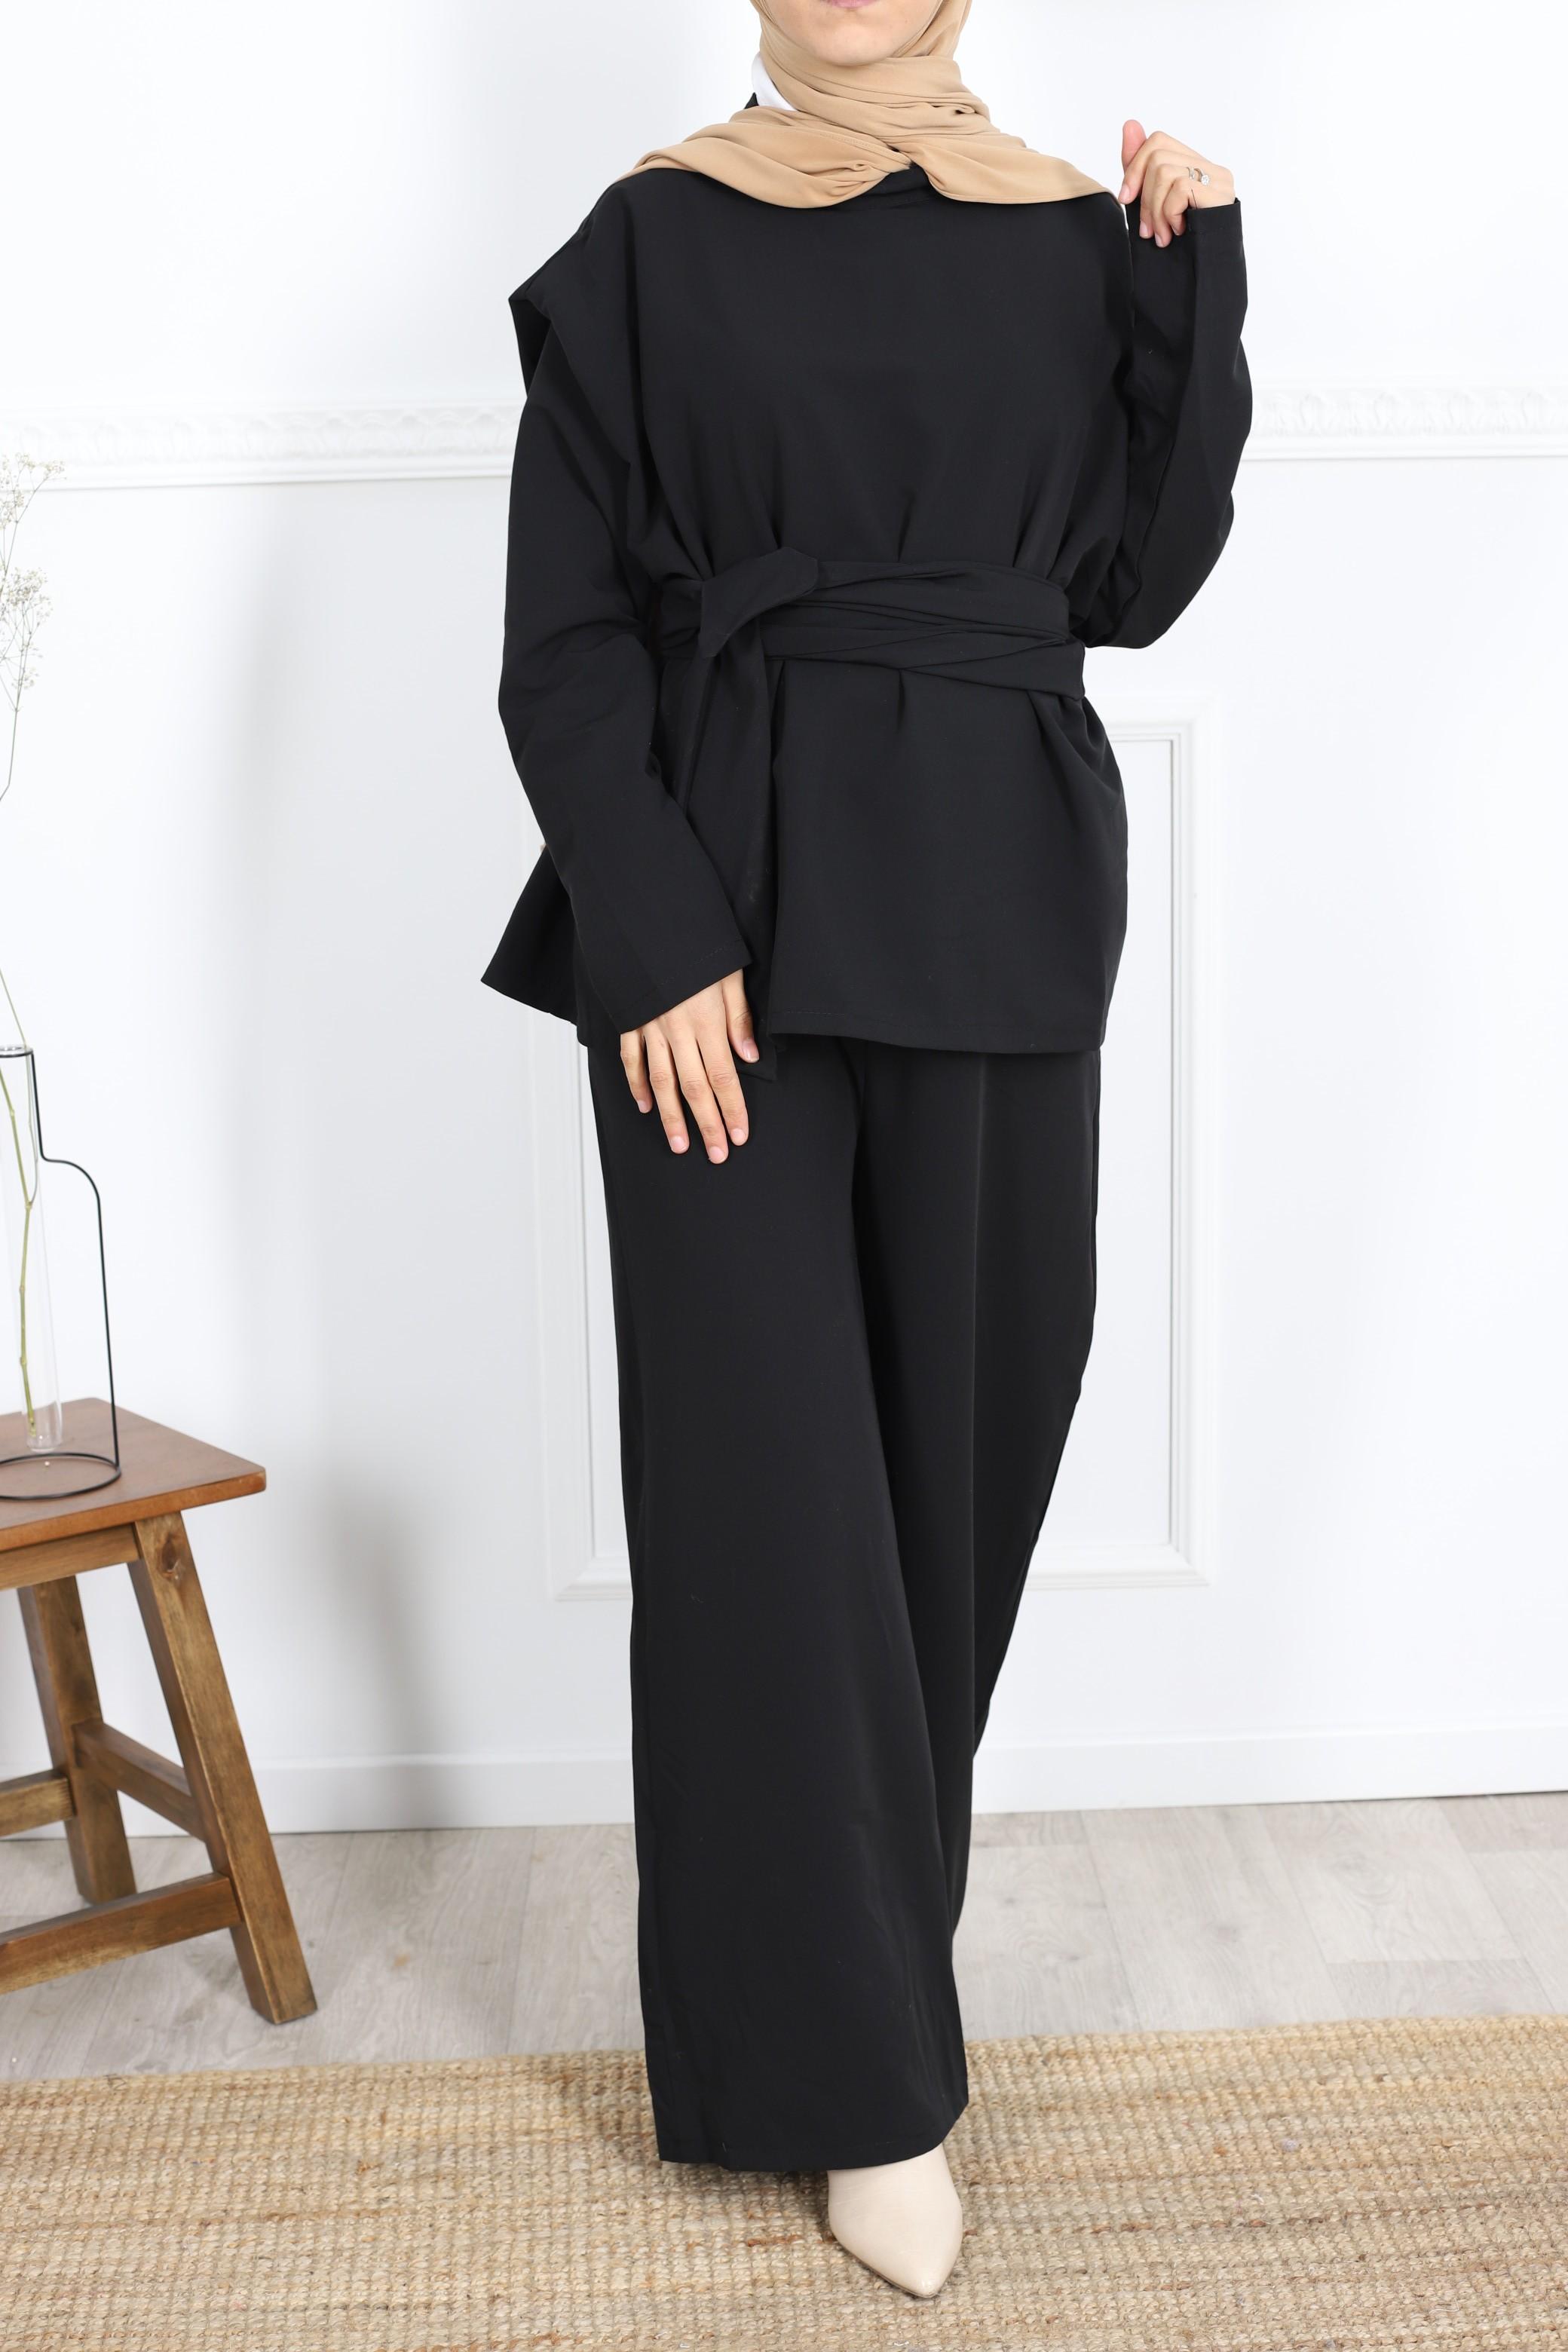 Ensemble belty noir